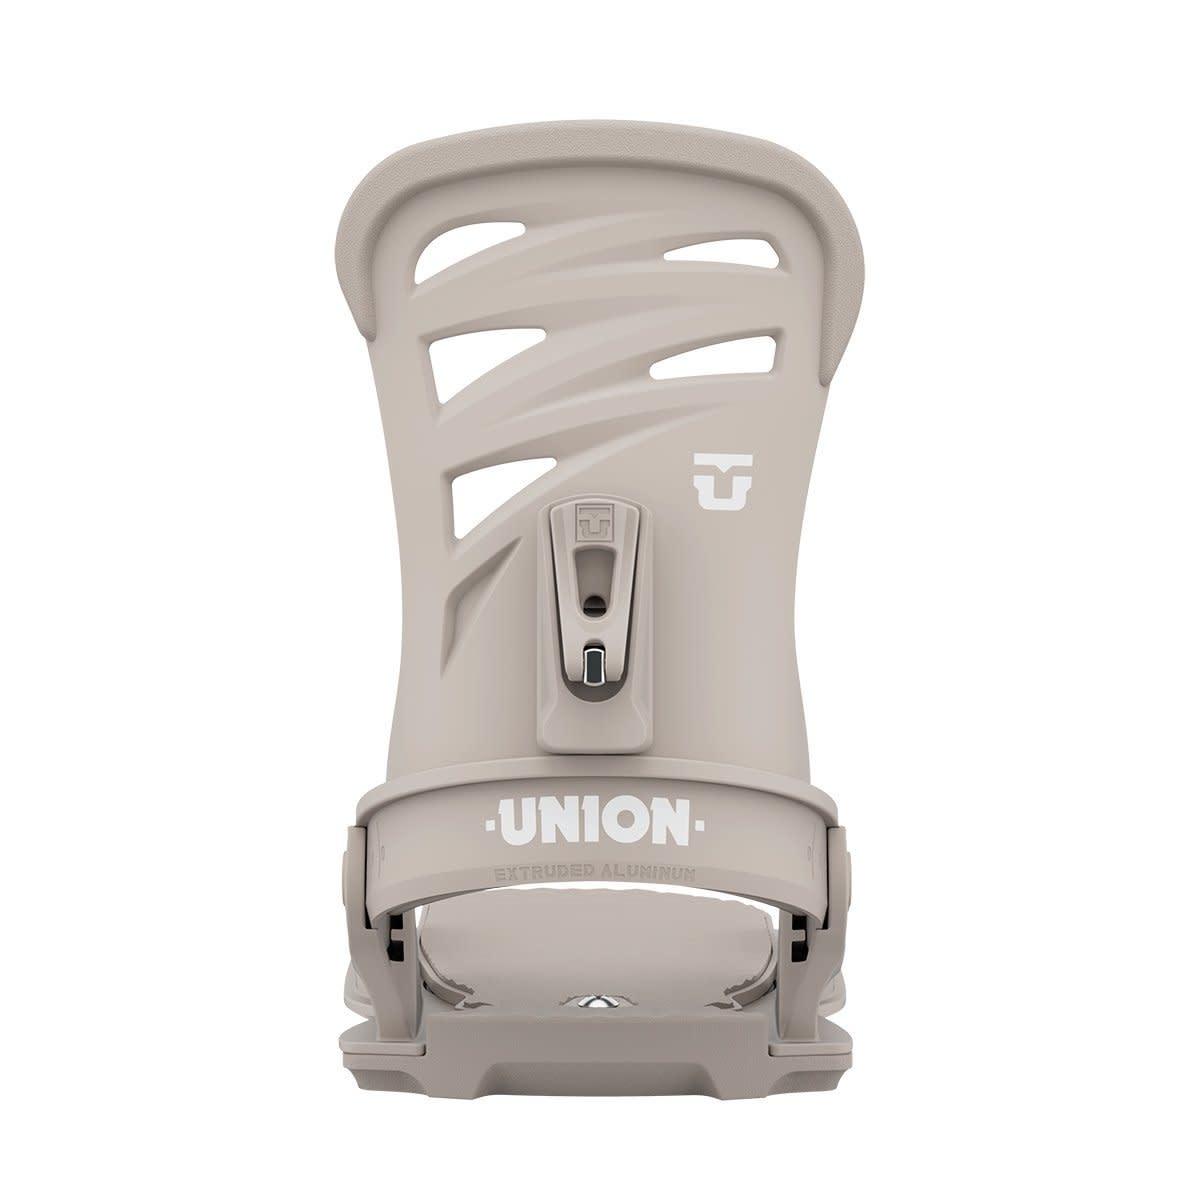 Union Union Women's Rosa Snowboard Binding (2021)